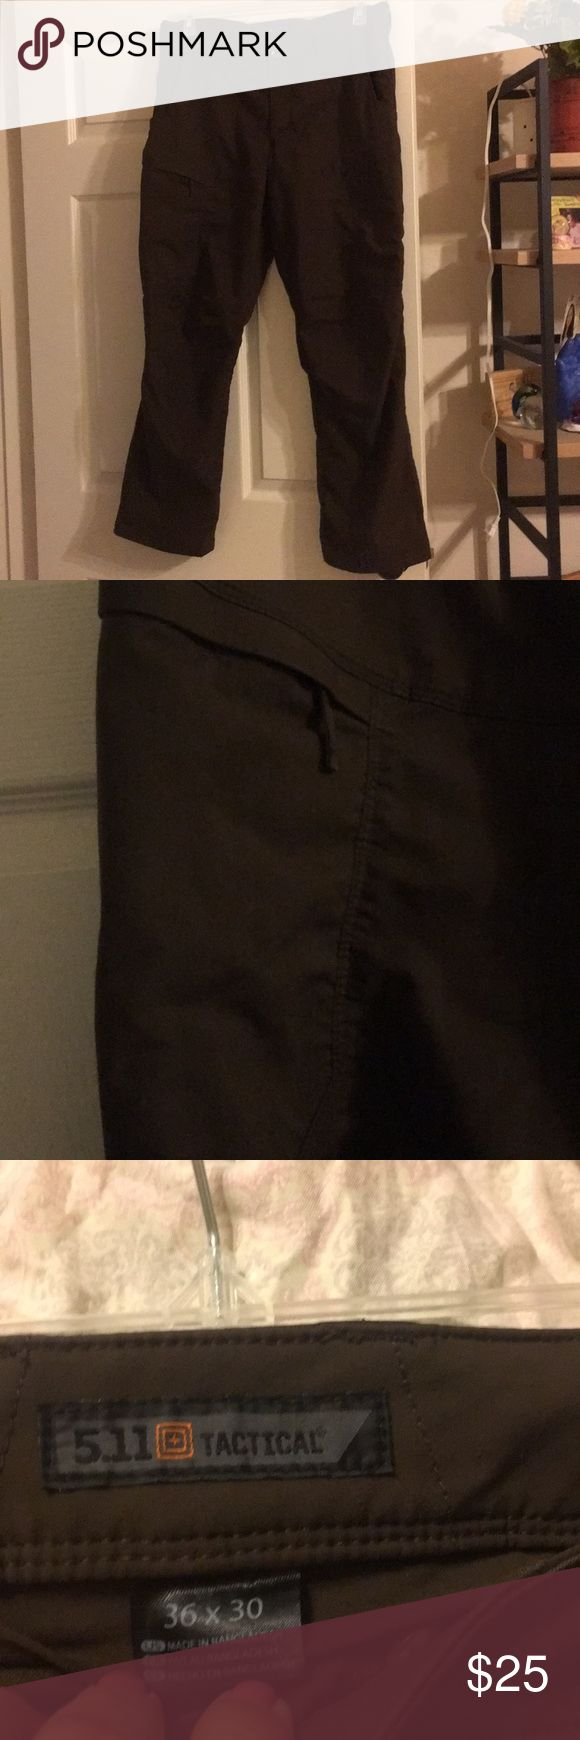 Men's tactical pants Brown cargo tactical pants. 36 / 30 511 TACTICAL Pants Cargo